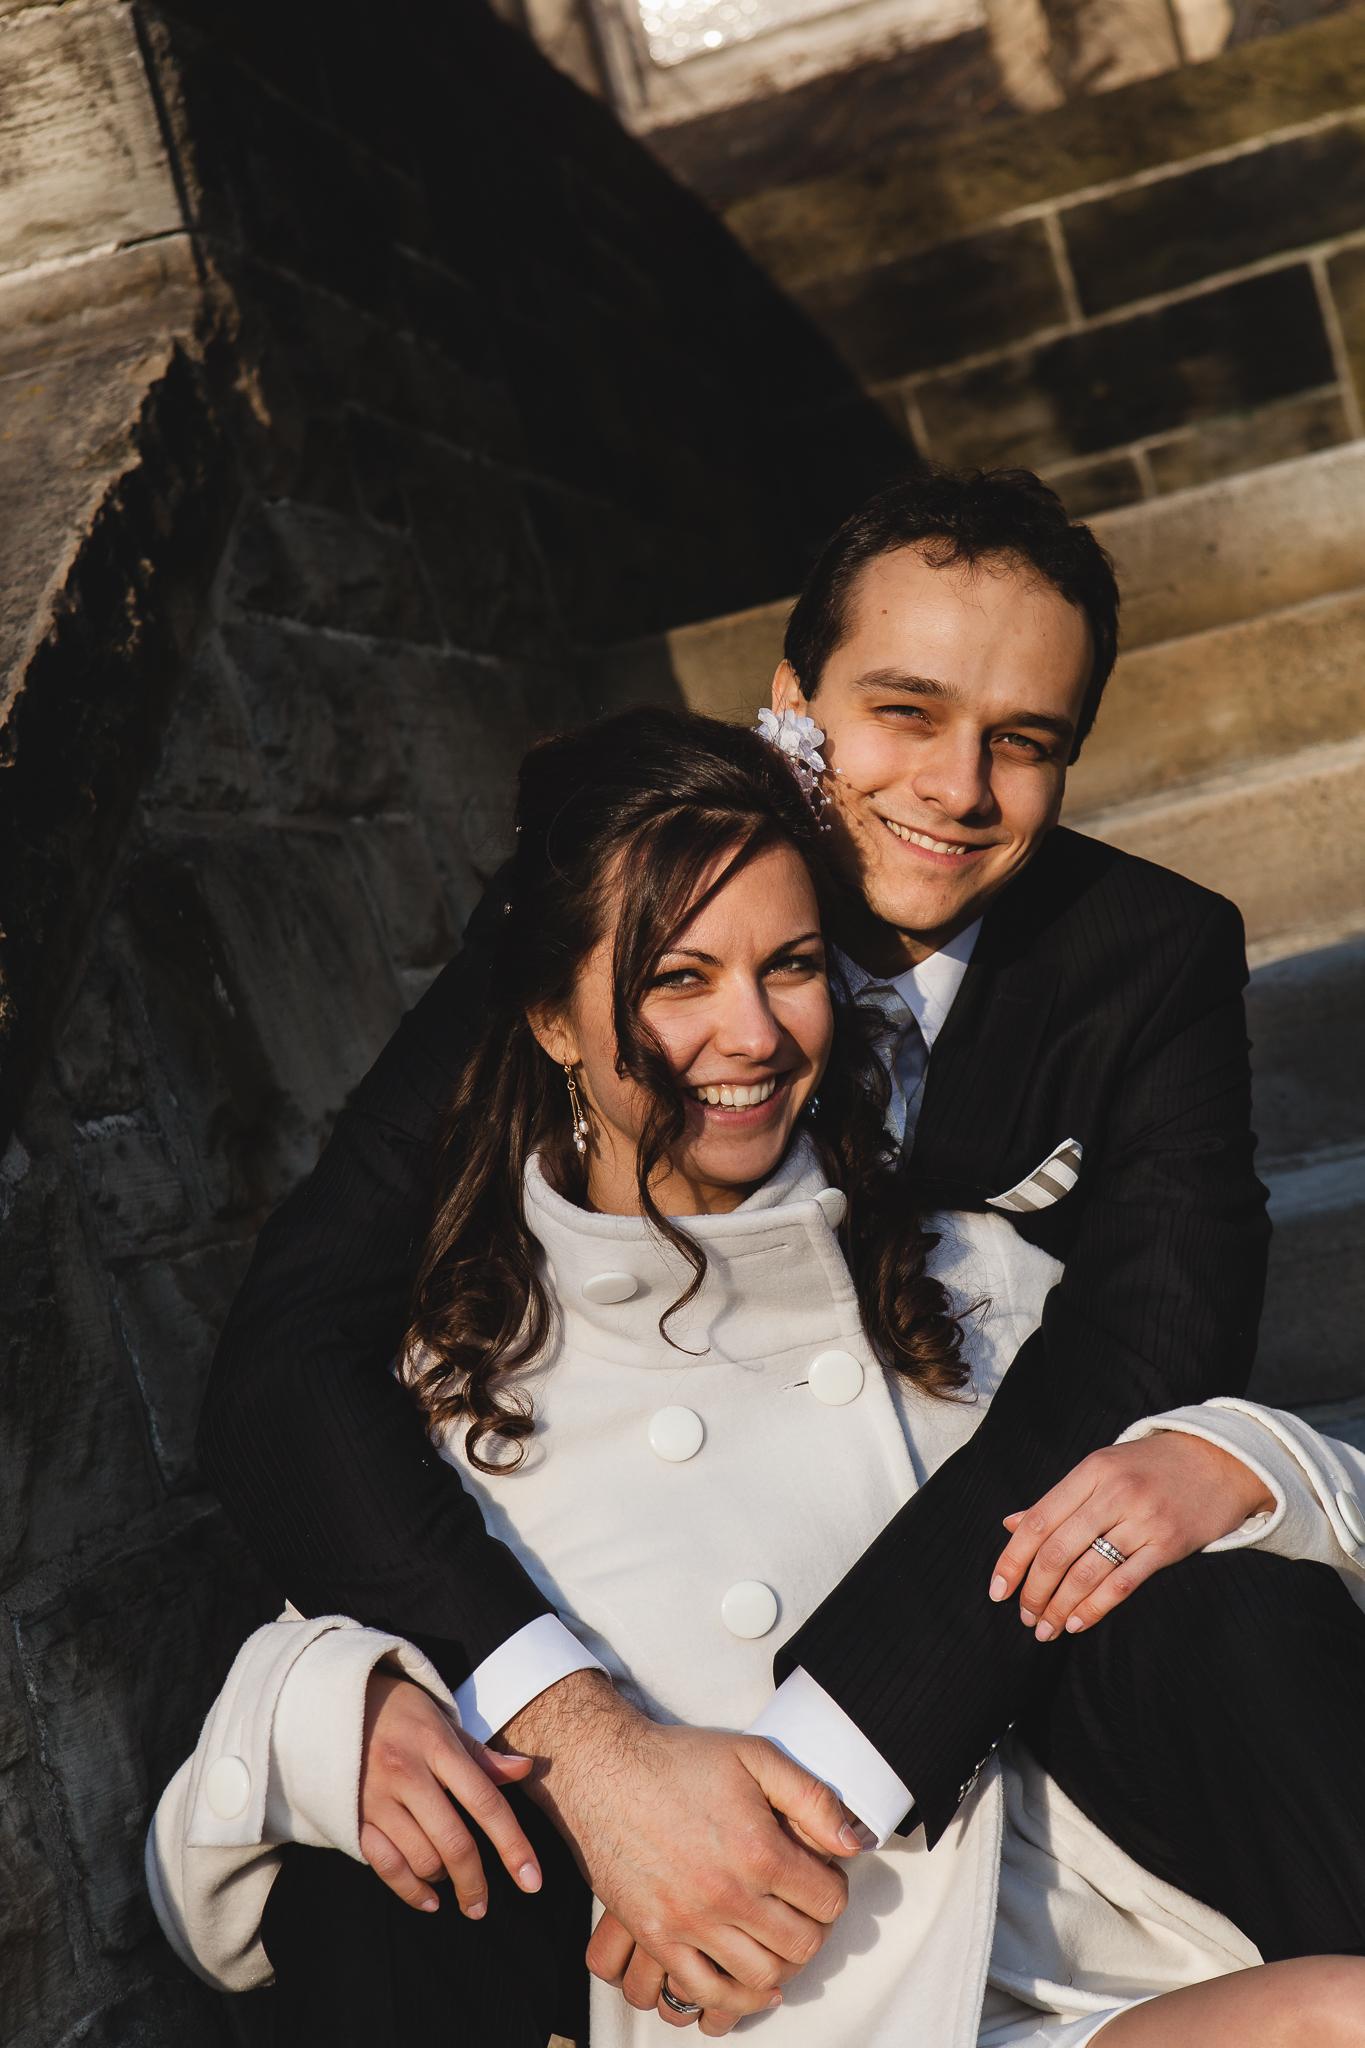 Toronto Wedding Photography - Zoya & Alexei -32.jpg